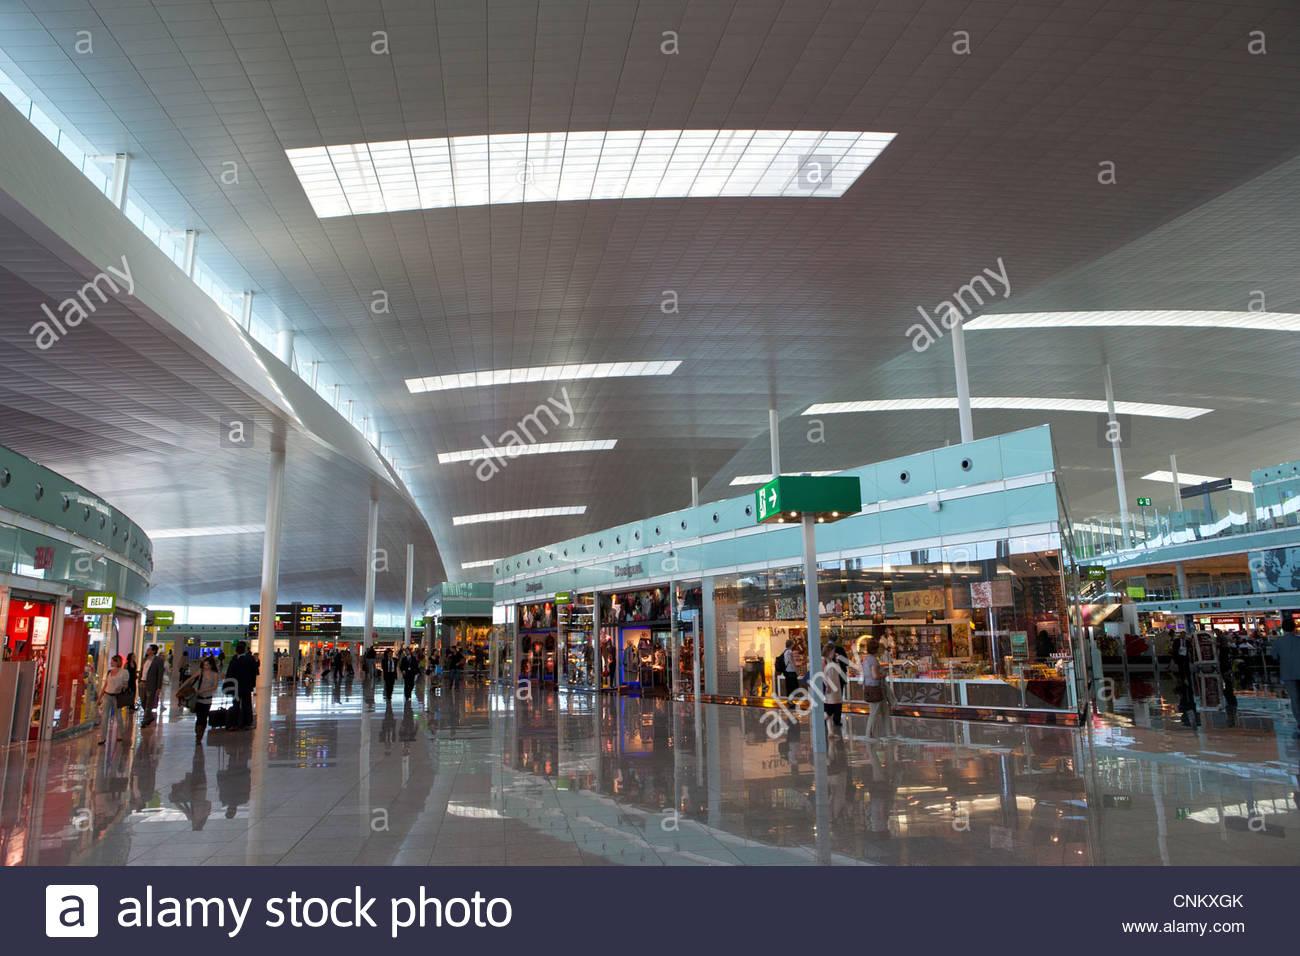 Terminal 1 at Barcelona Airport, Spain - Stock Image